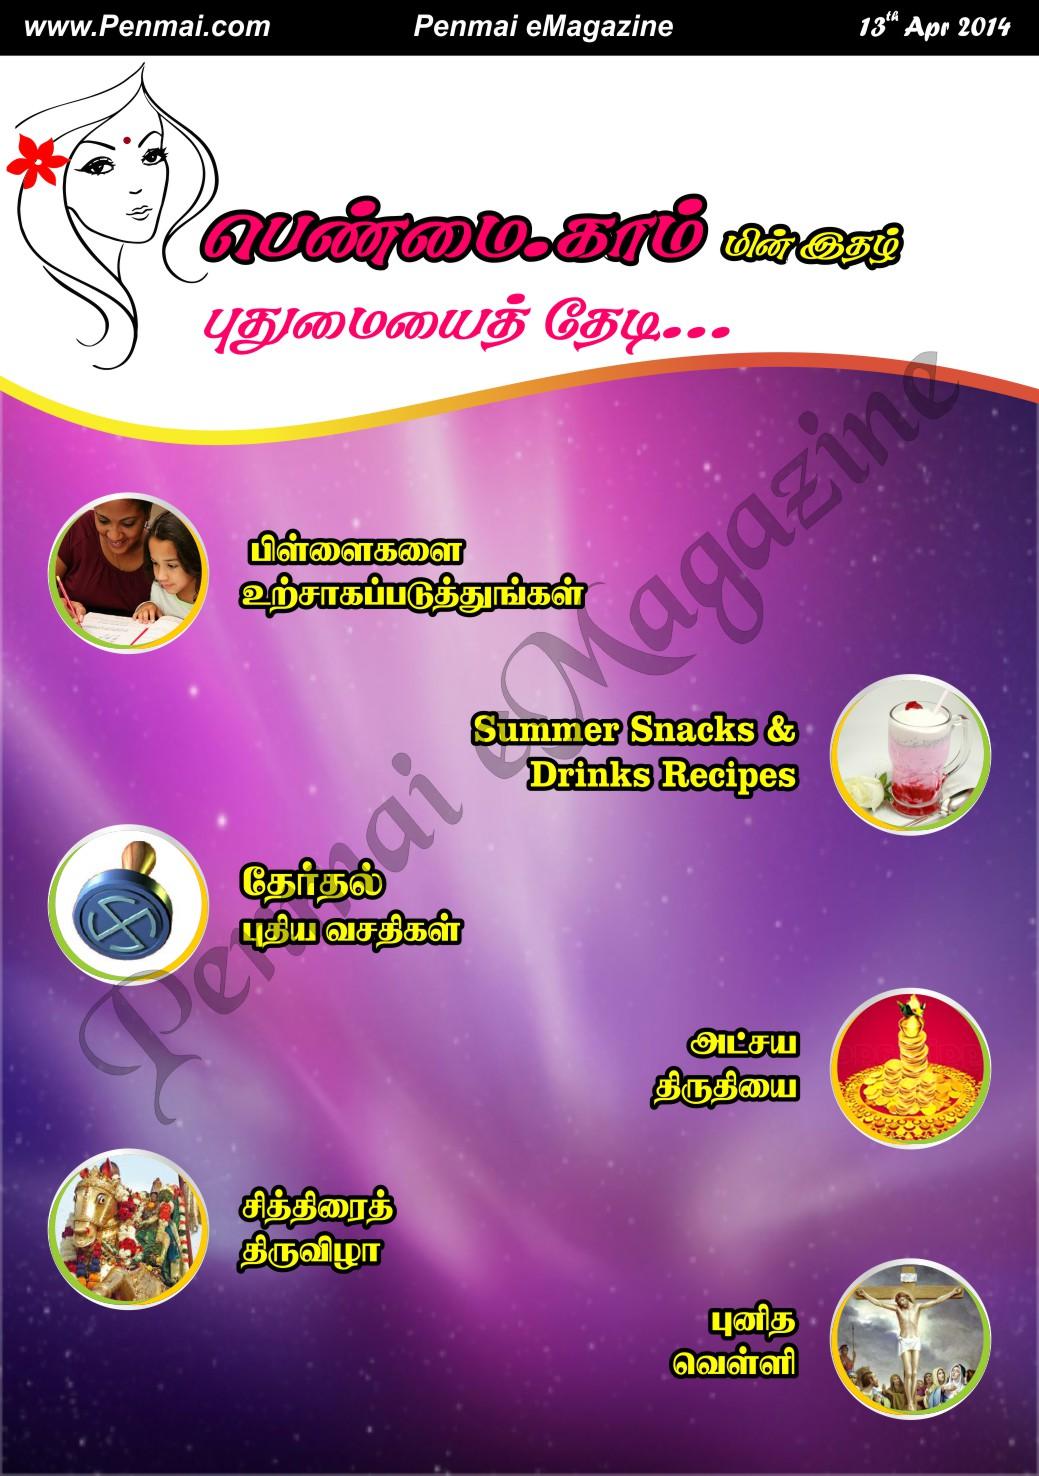 Name:  Penmai eMagazine April 2014-1.jpg Views: 779 Size:  286.6 KB